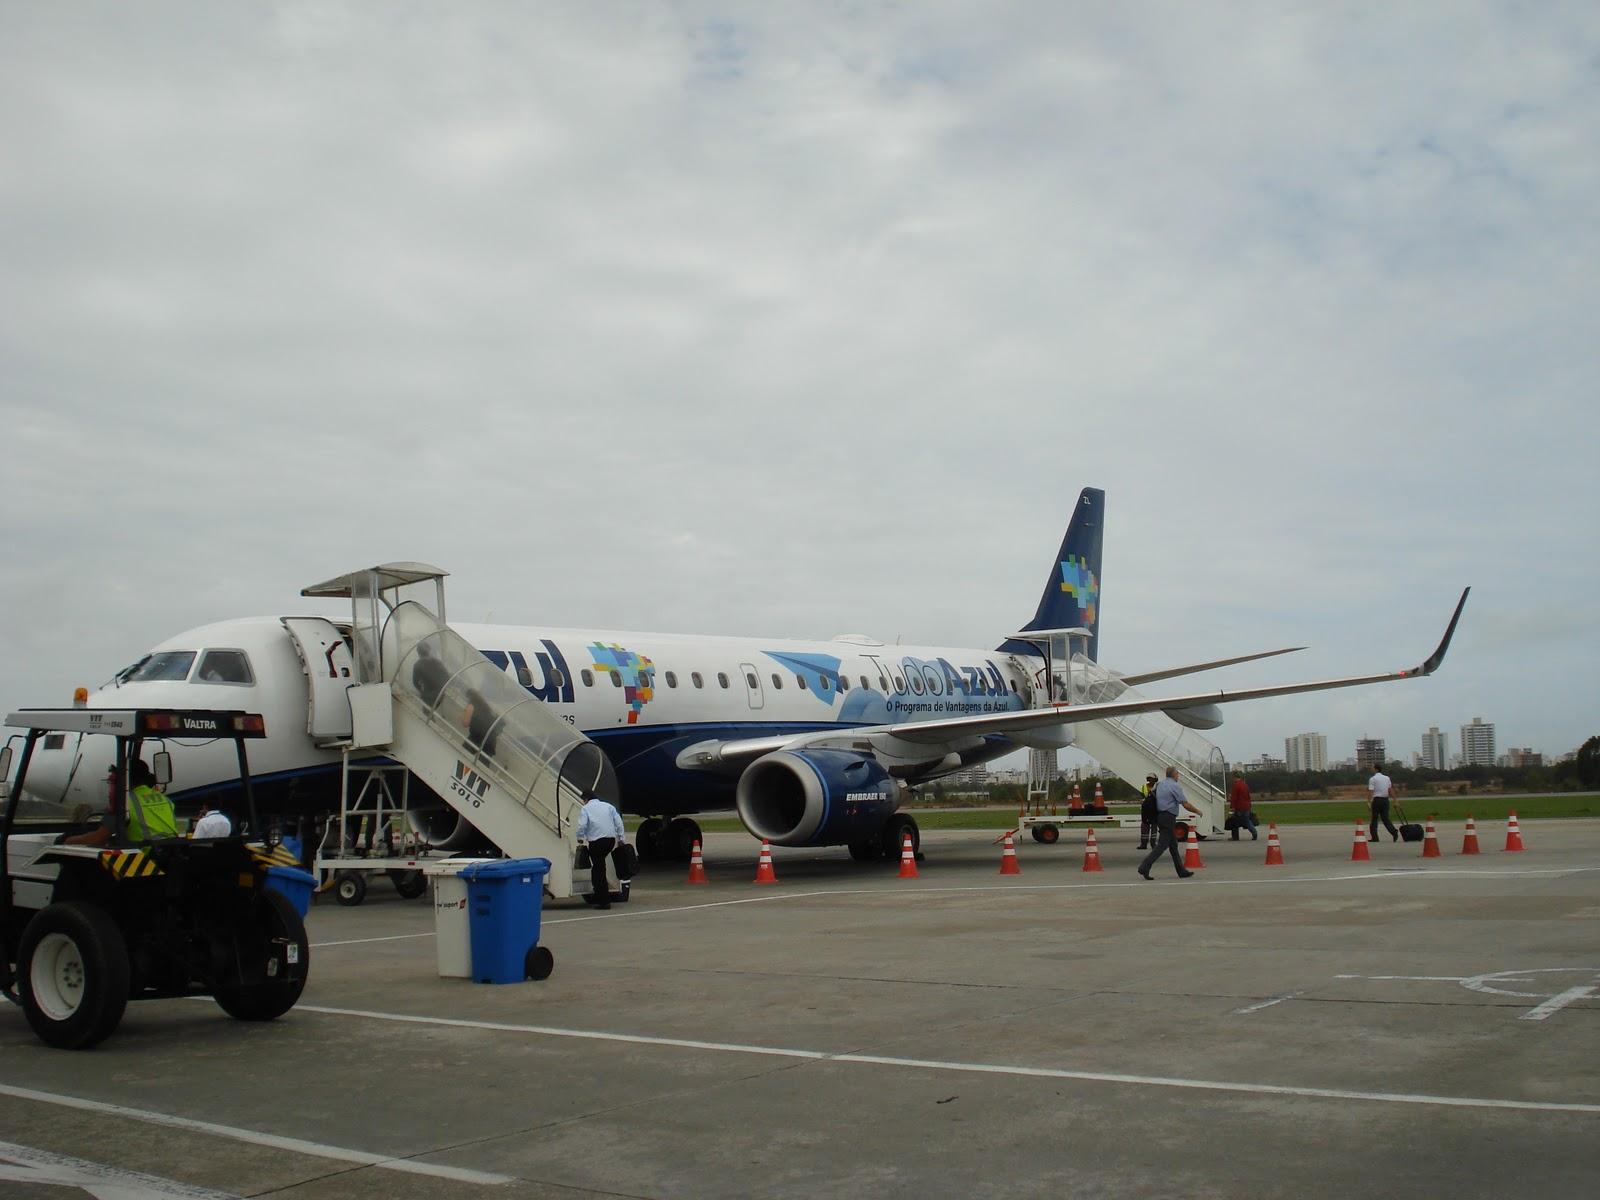 Aeroporto Vix : Sbvt on line aeroporto de vitÓria es primeiro avião emb da